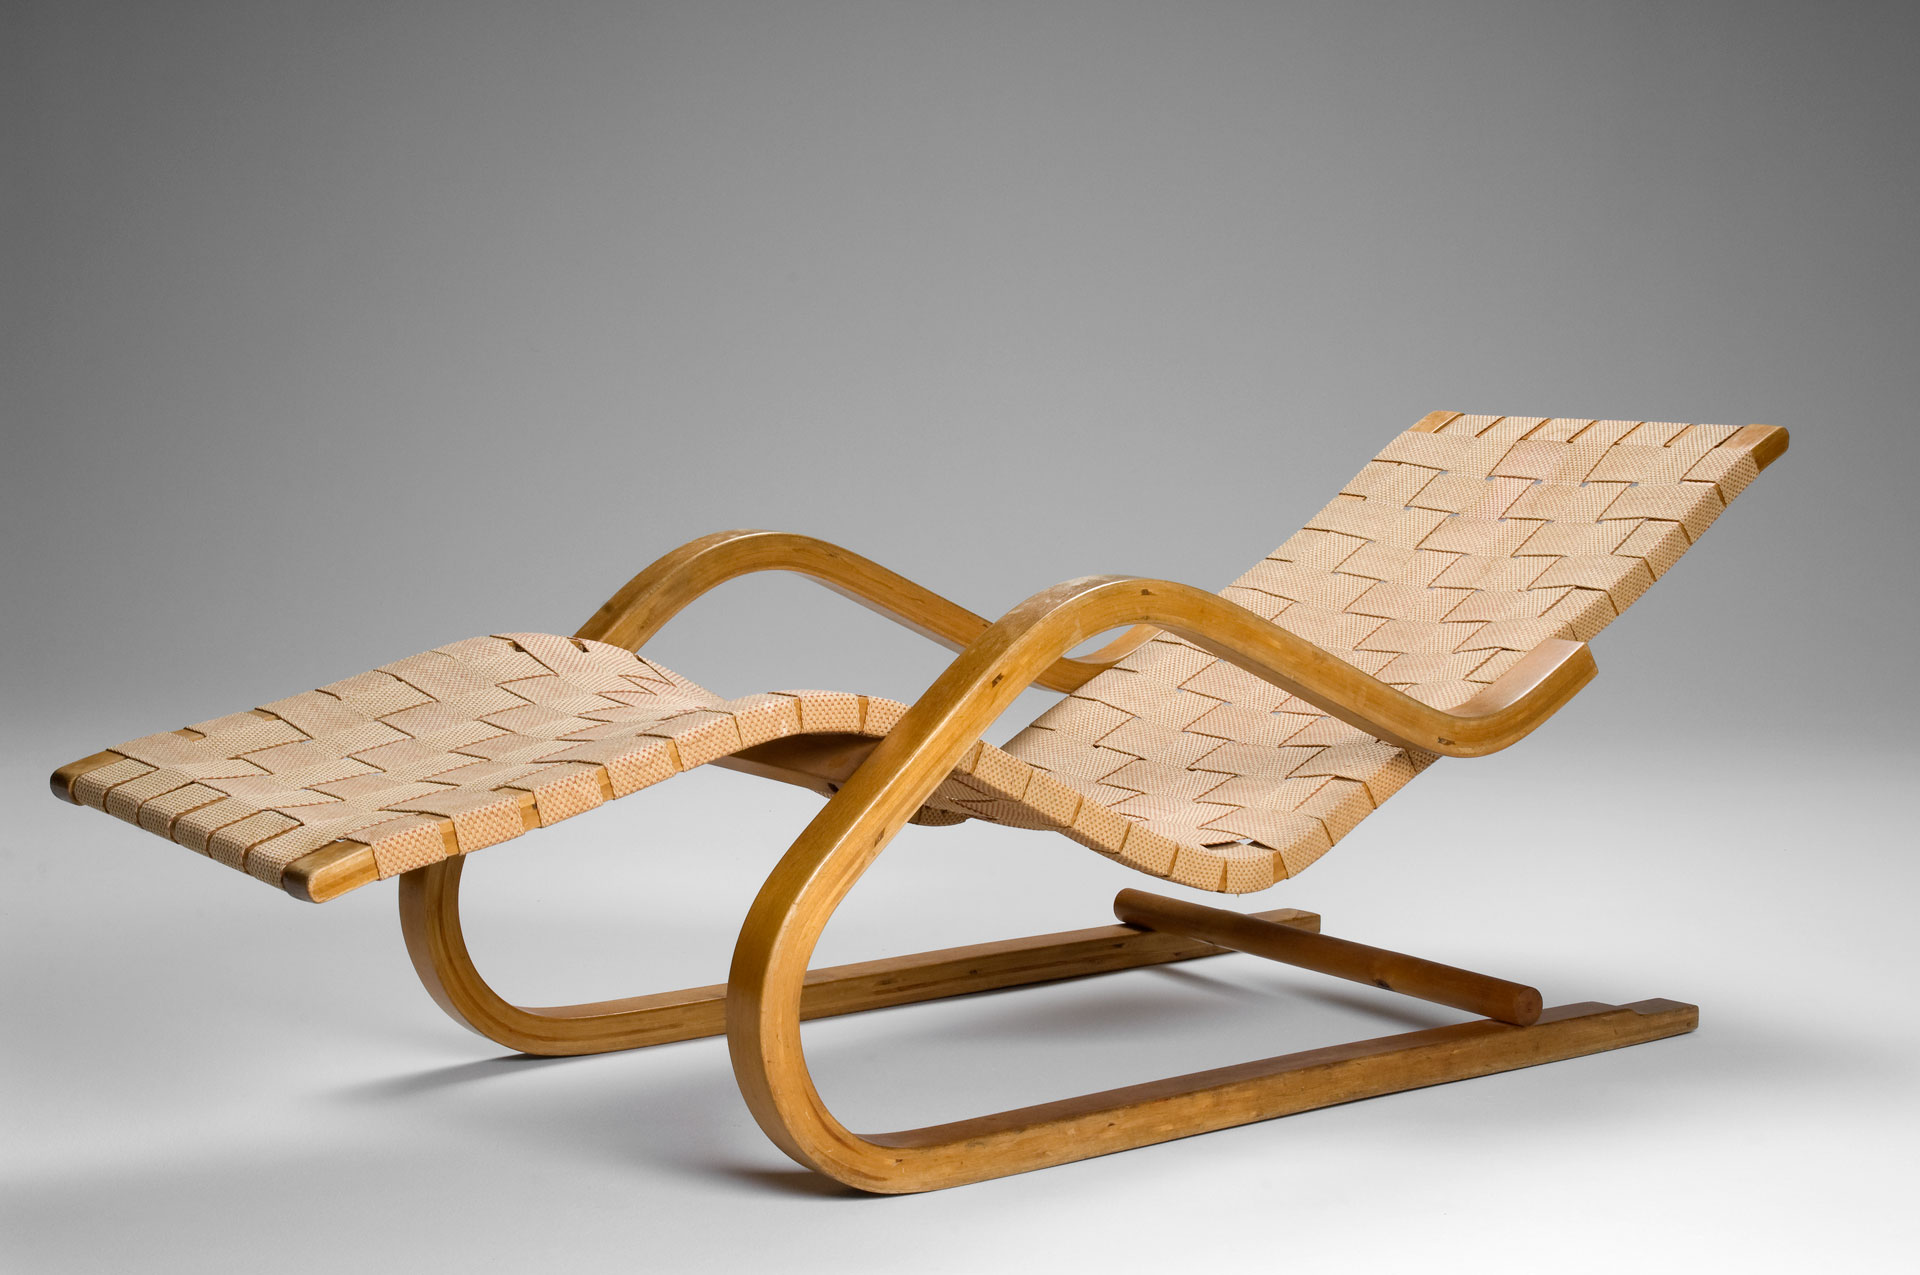 Lounge Chair Jacksons No43 Alvar Aalto wPOkXiZTlu